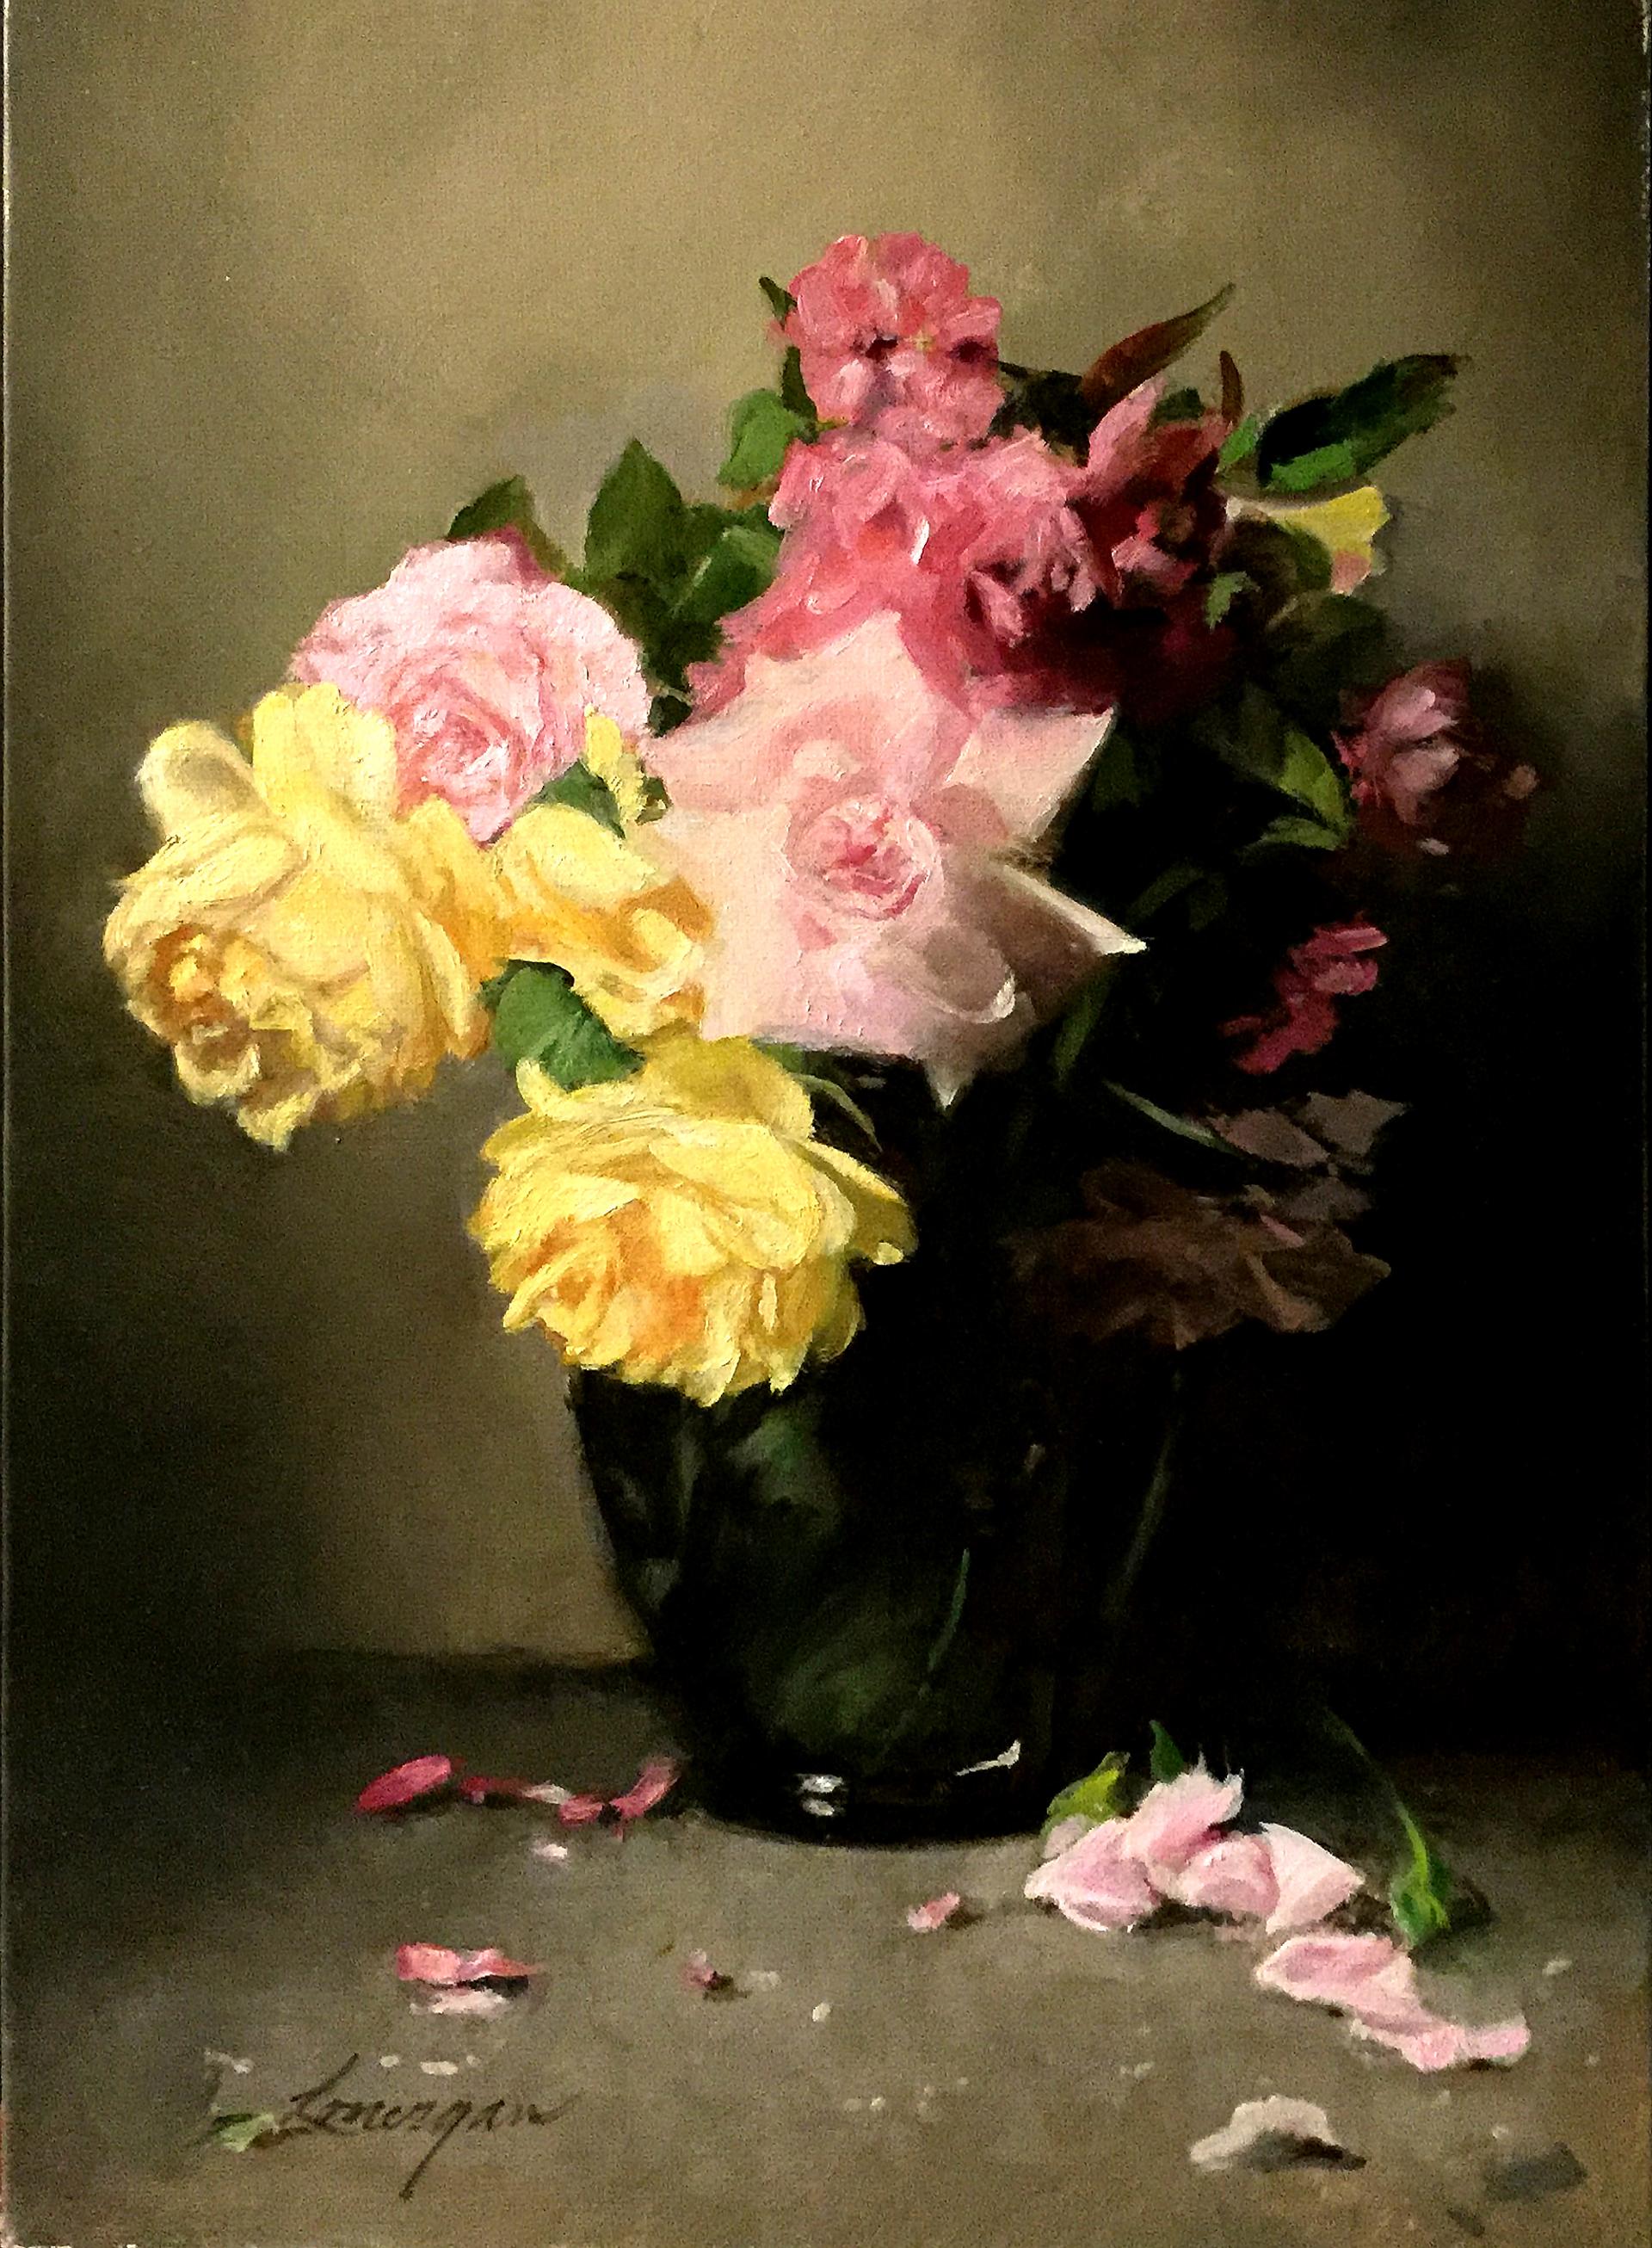 Rose Bouquet by John Lonergan